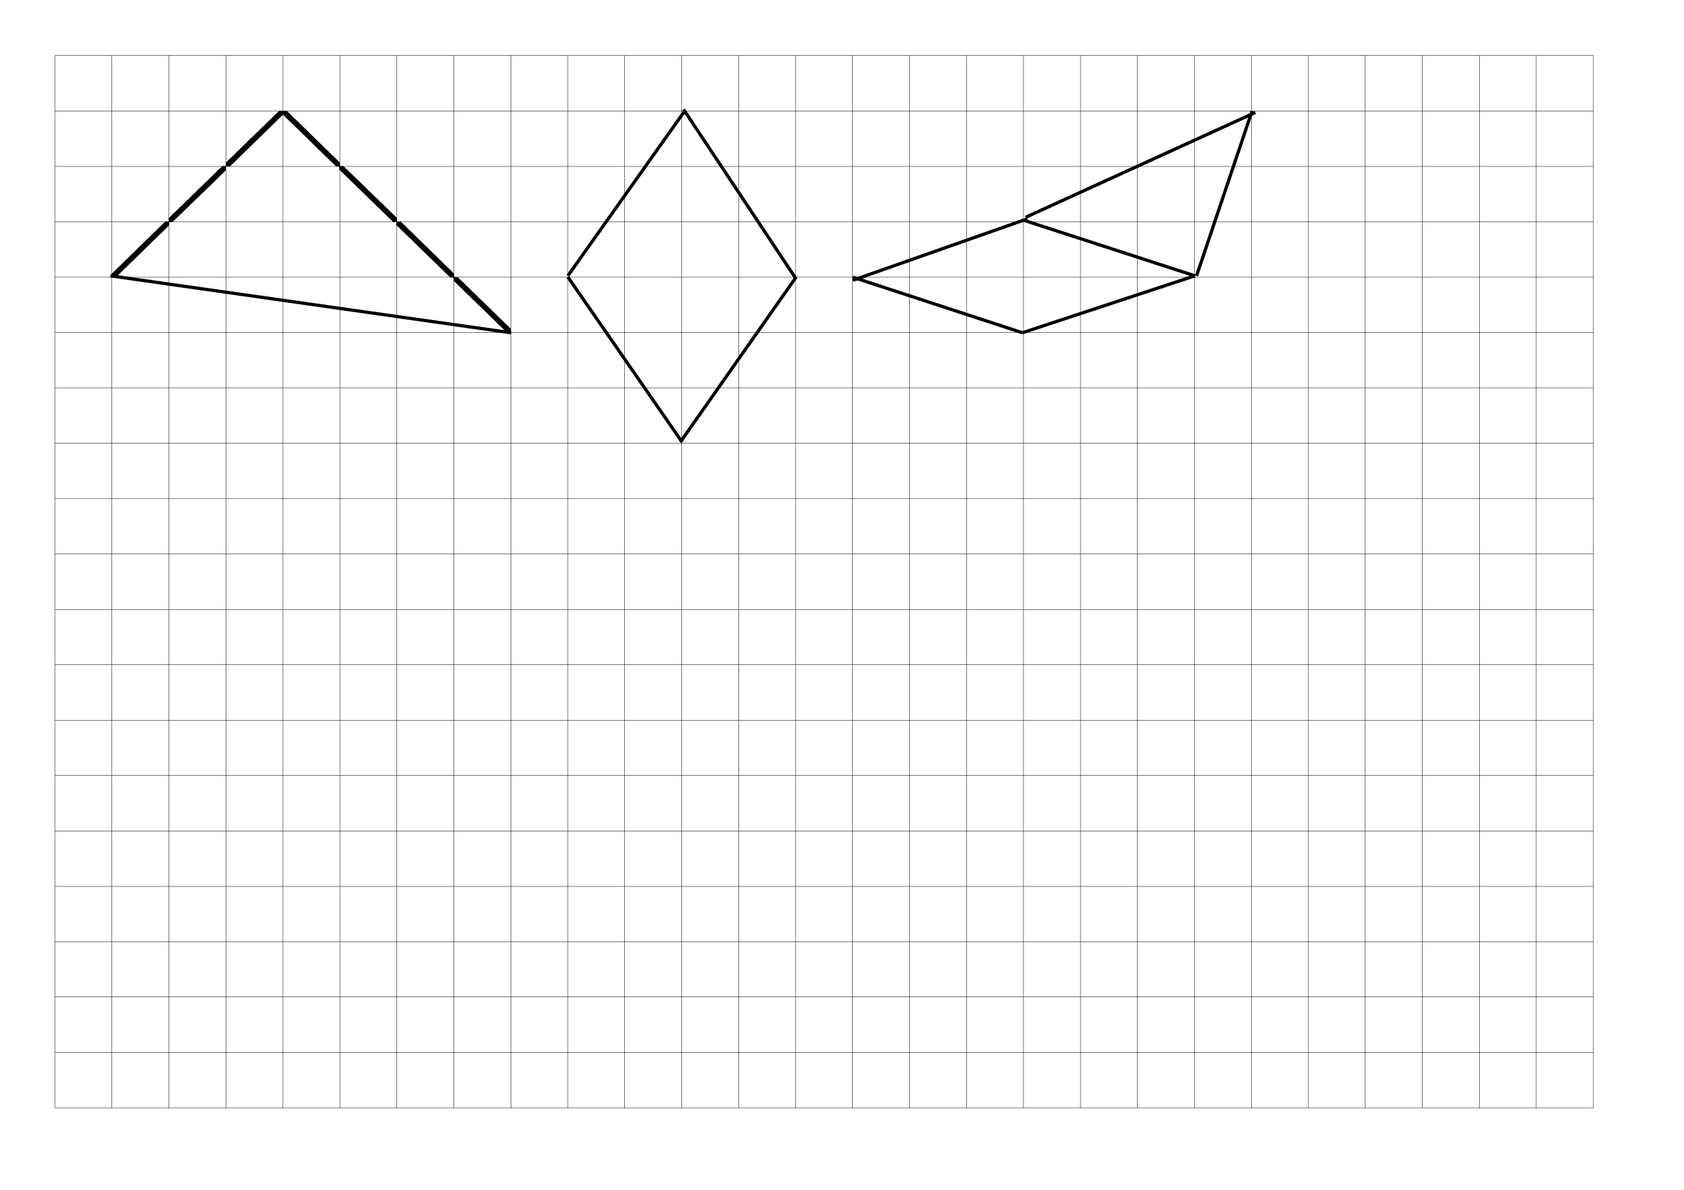 Calameo Cycle 3 Geometrie Figures Planes Exercice De Reproduction